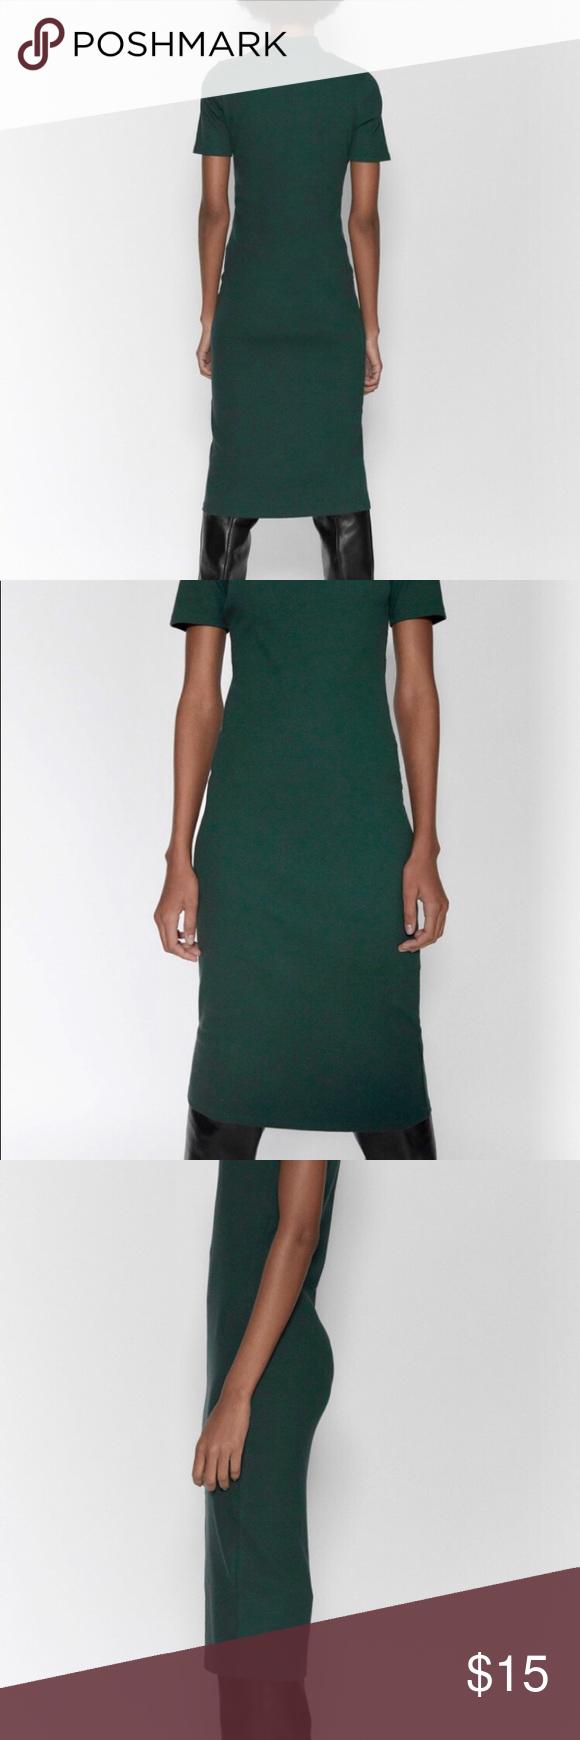 Nwt Zara Ribbed Dress Green S Nwt Zara Ribbed Dress High Collar Shorty Sleeves Long Below Knee Dress Color Green Siz Ribbed Dresses Green Dress Knee Dress [ 1740 x 580 Pixel ]